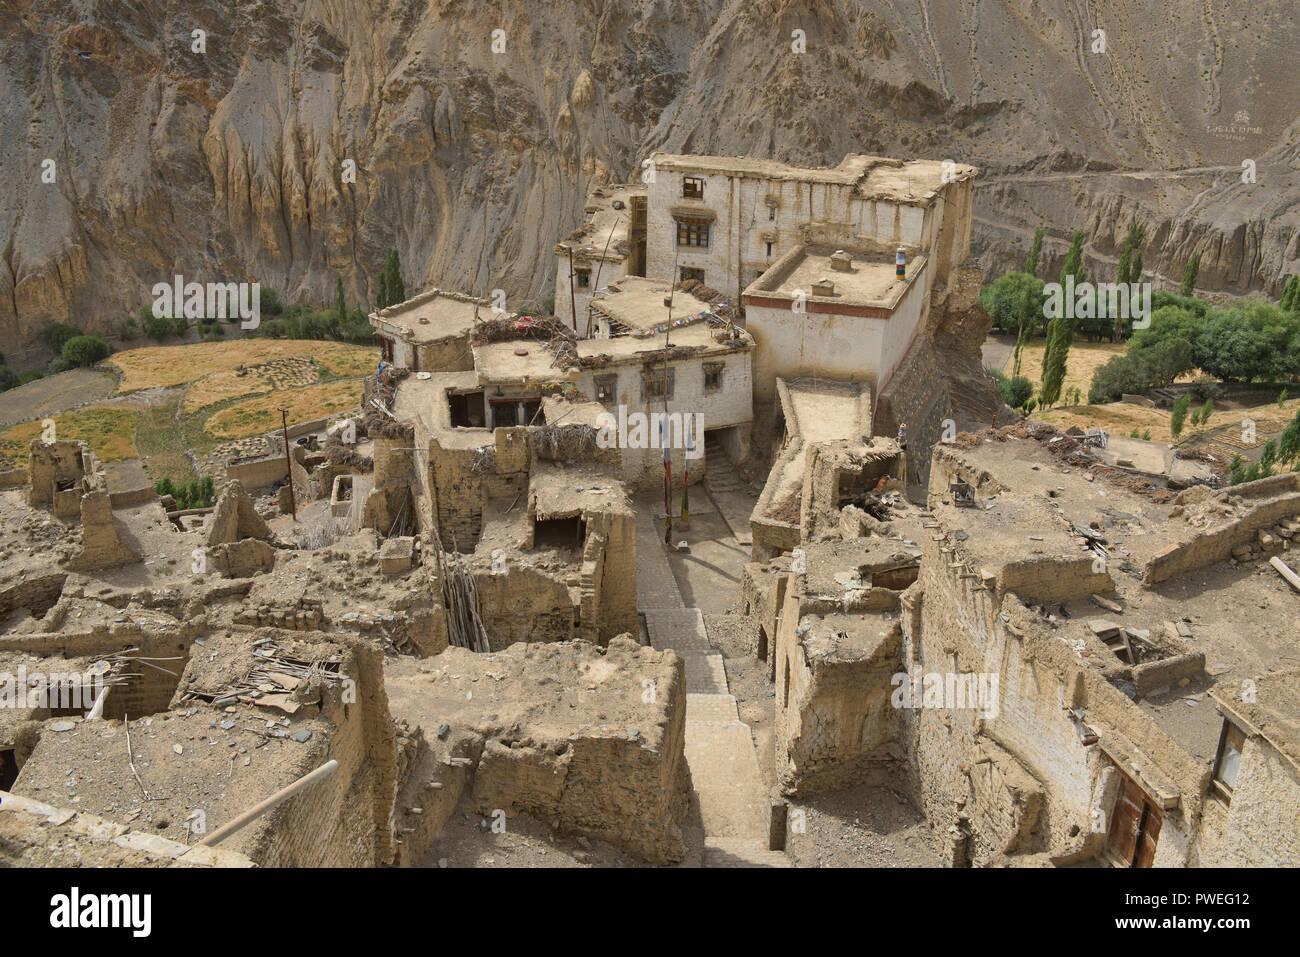 Old mud-brick houses in Lamayuru, Ladakh, India - Stock Image